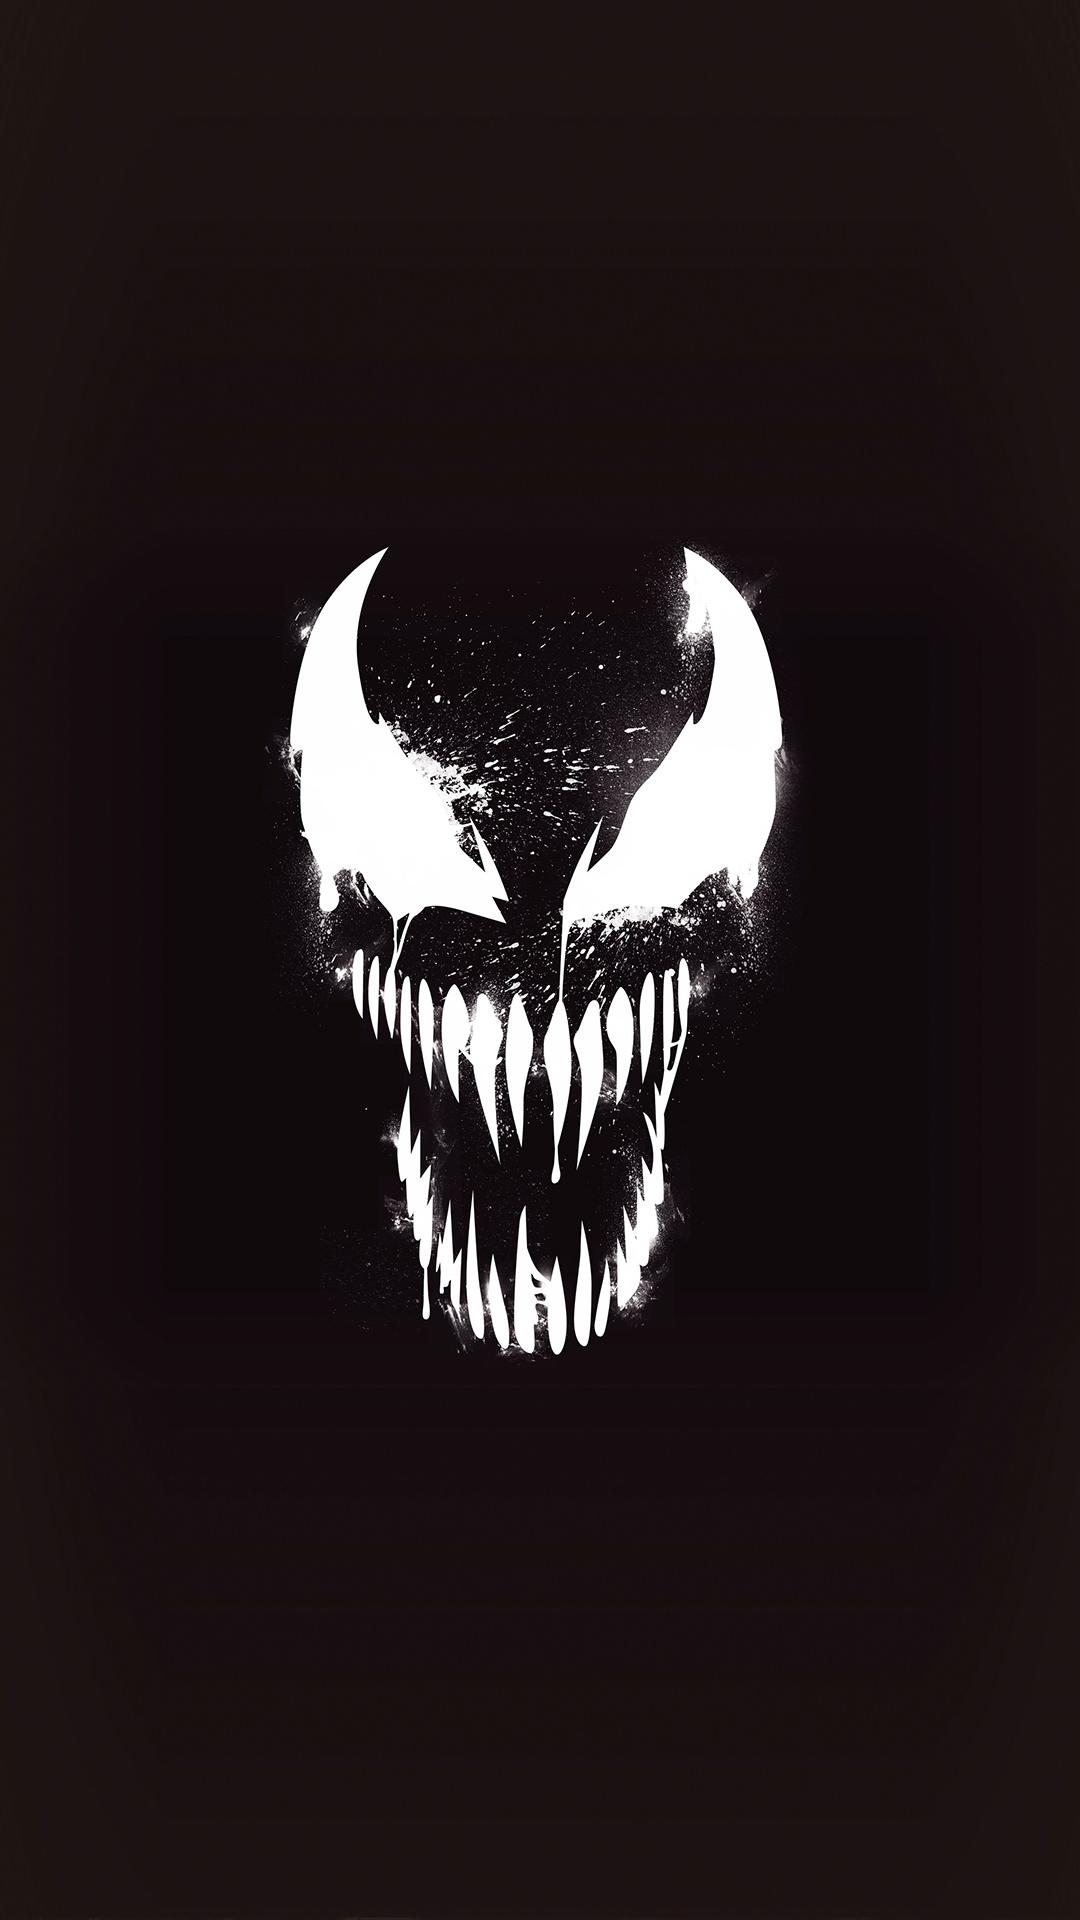 Venom Dark Minimal iPhone Wallpaper - iPhone Wallpapers ...